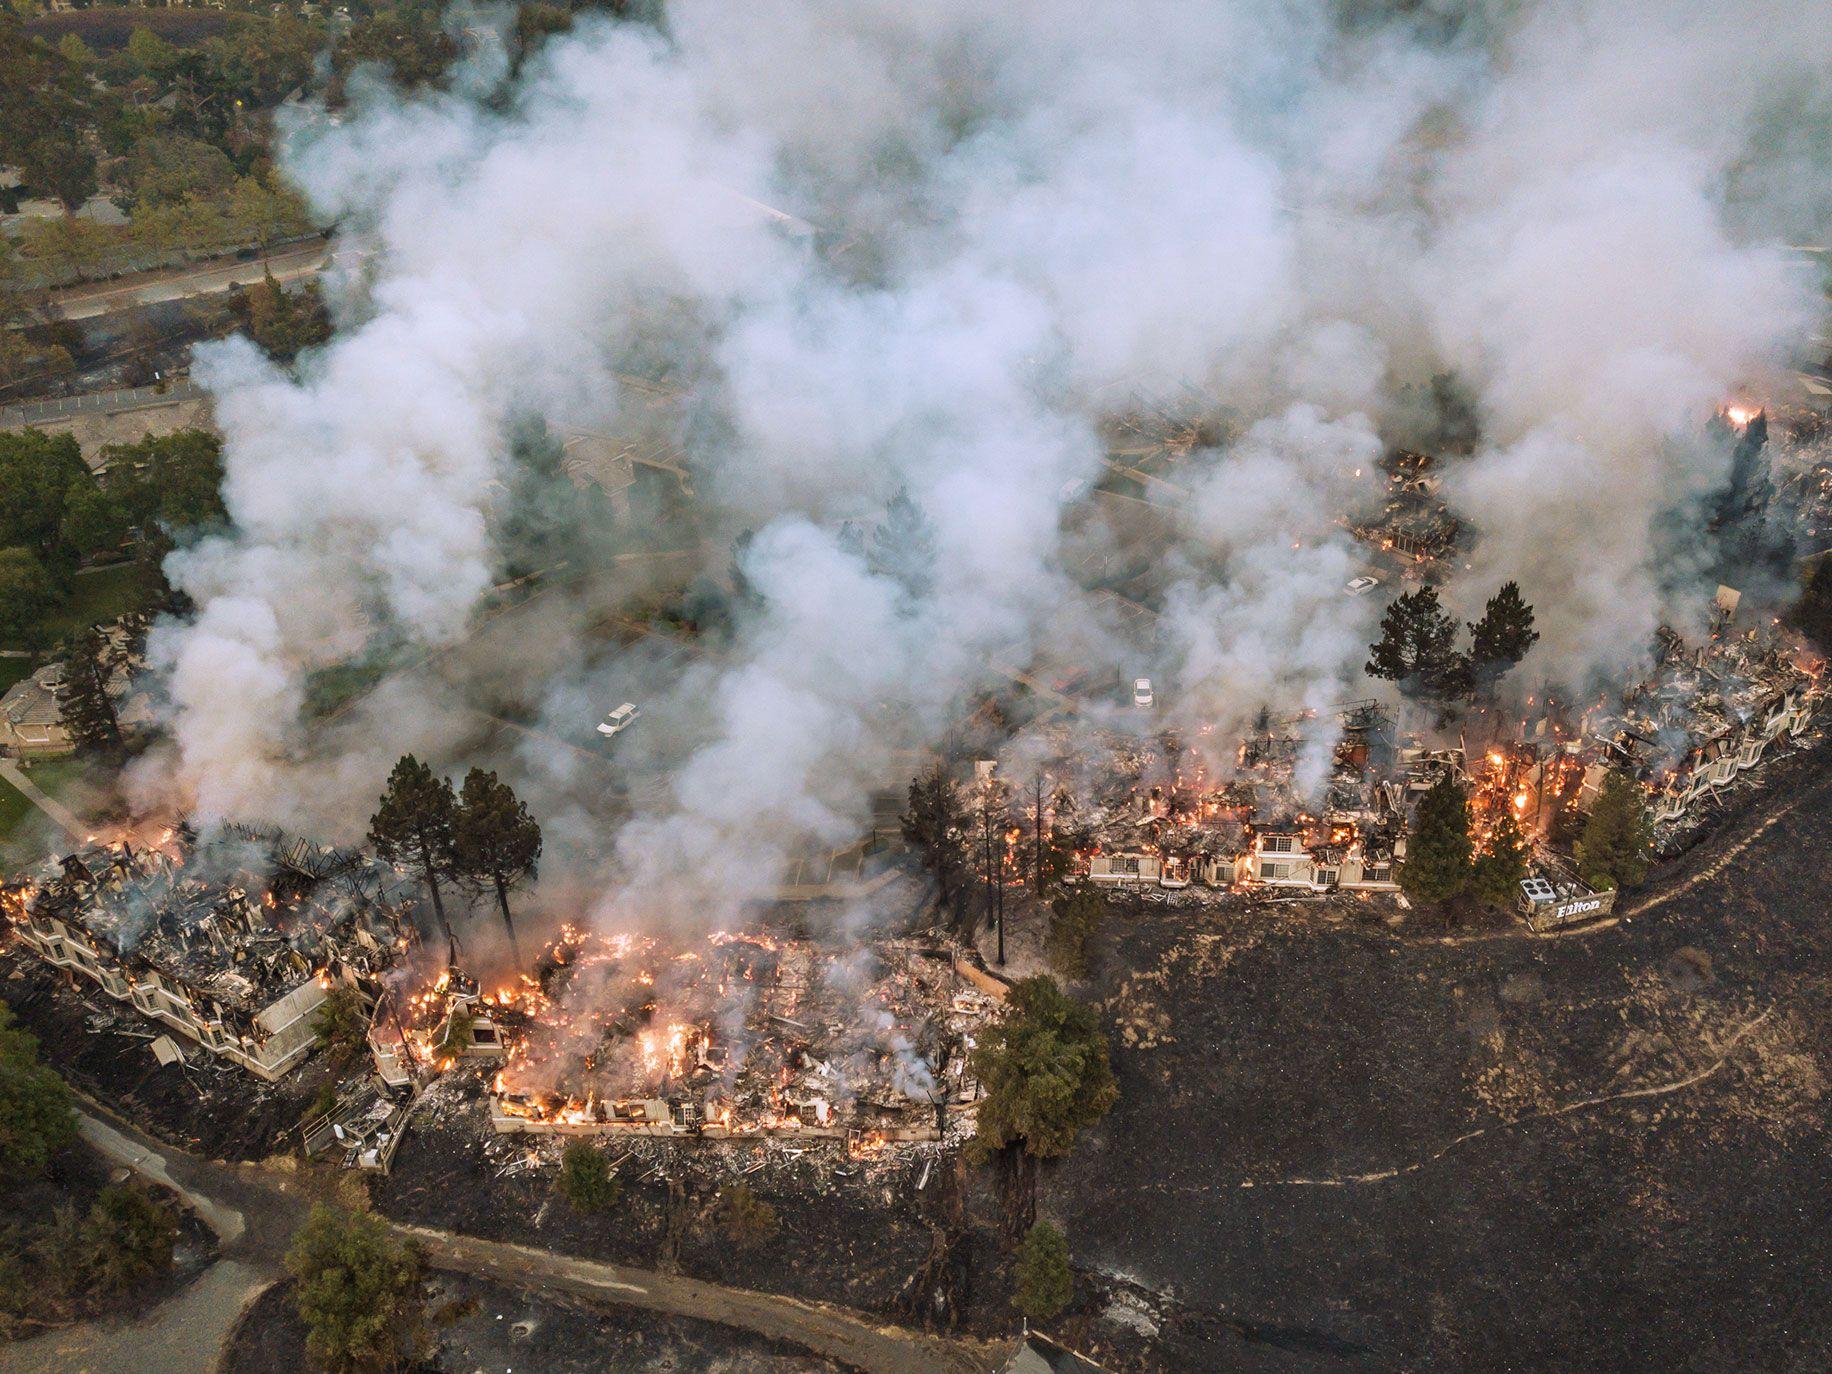 Sonoma's Burning Problem